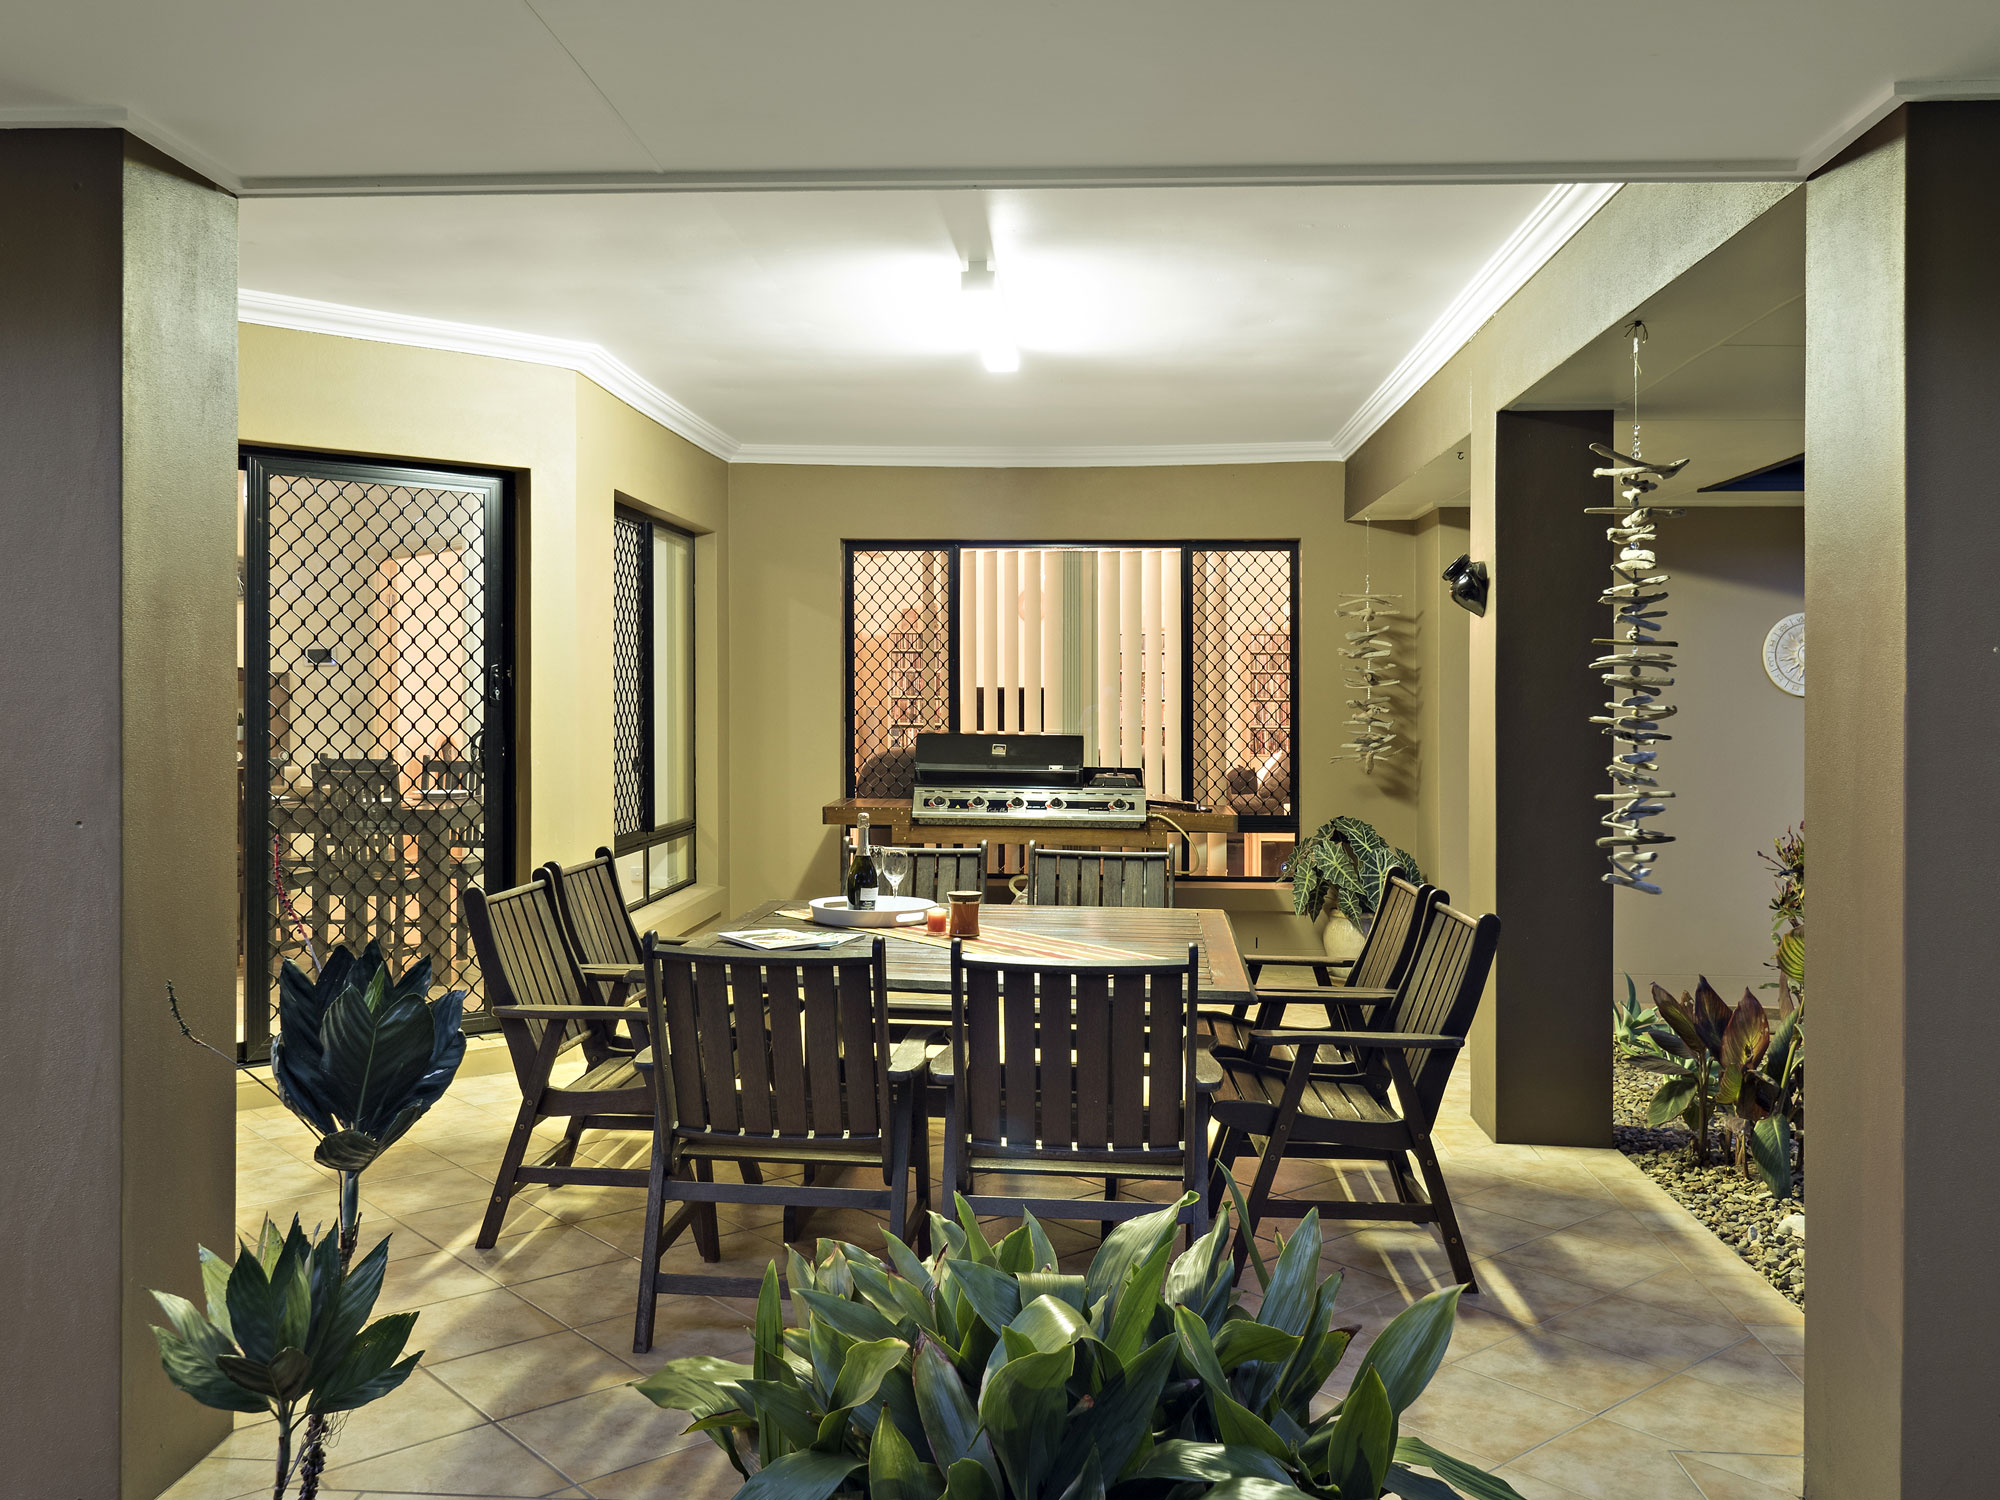 Real estate photography, 18 Grandview st Kuraby